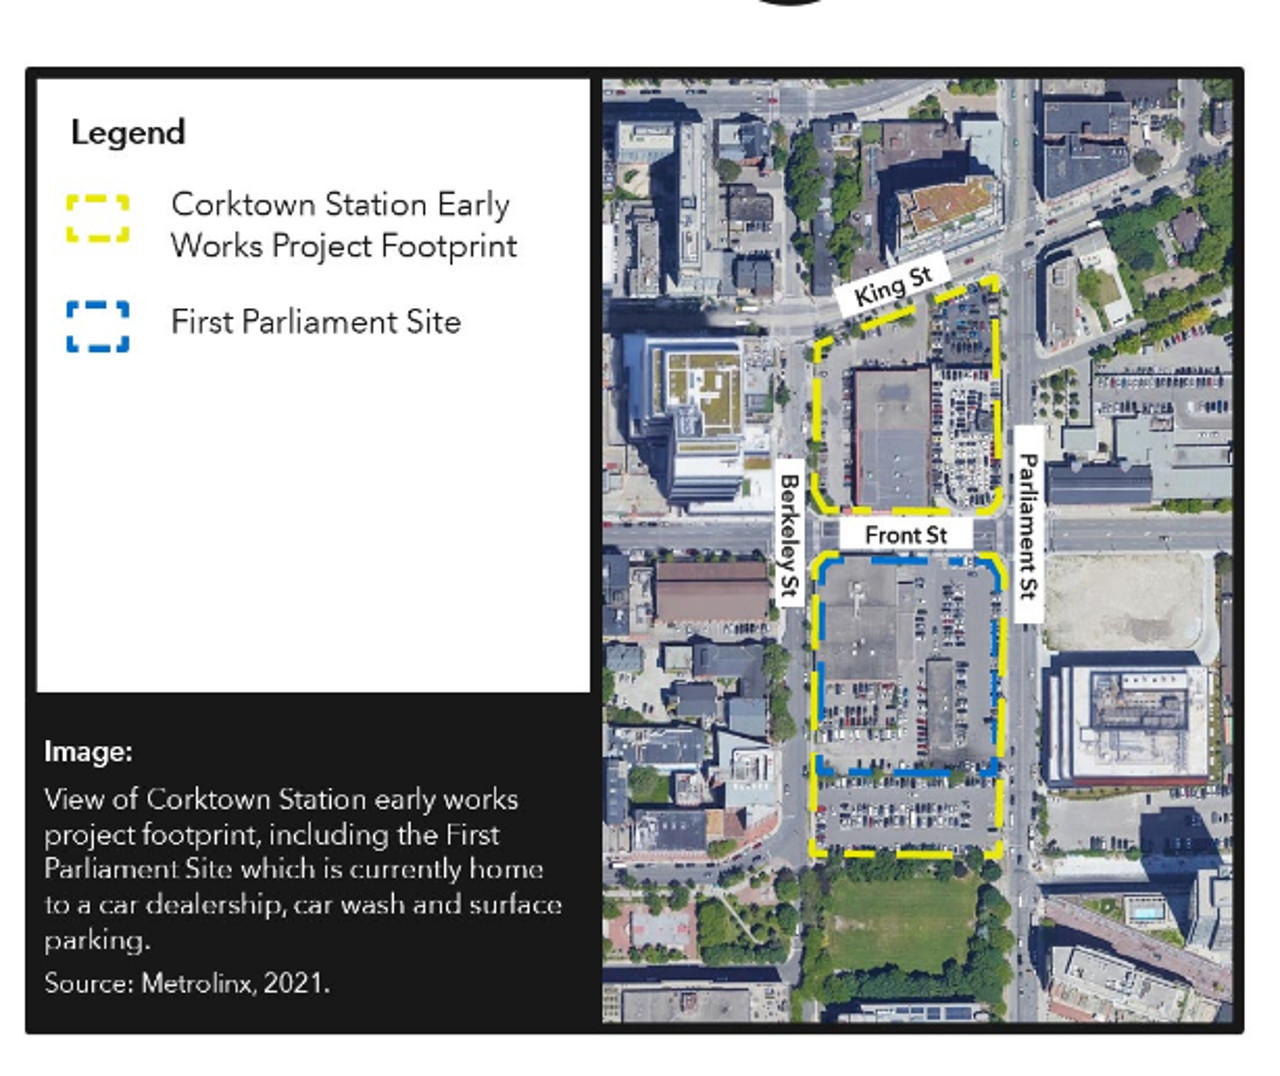 Map of the area around Corktown Station